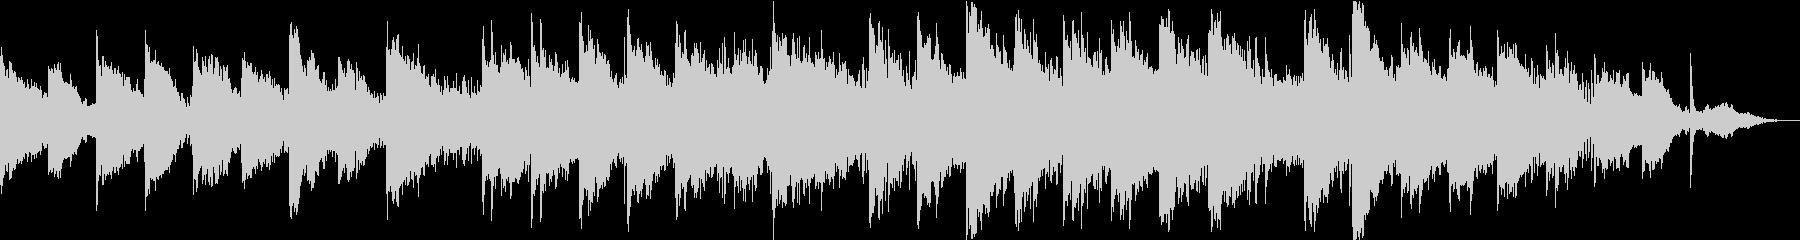 CInematicの未再生の波形